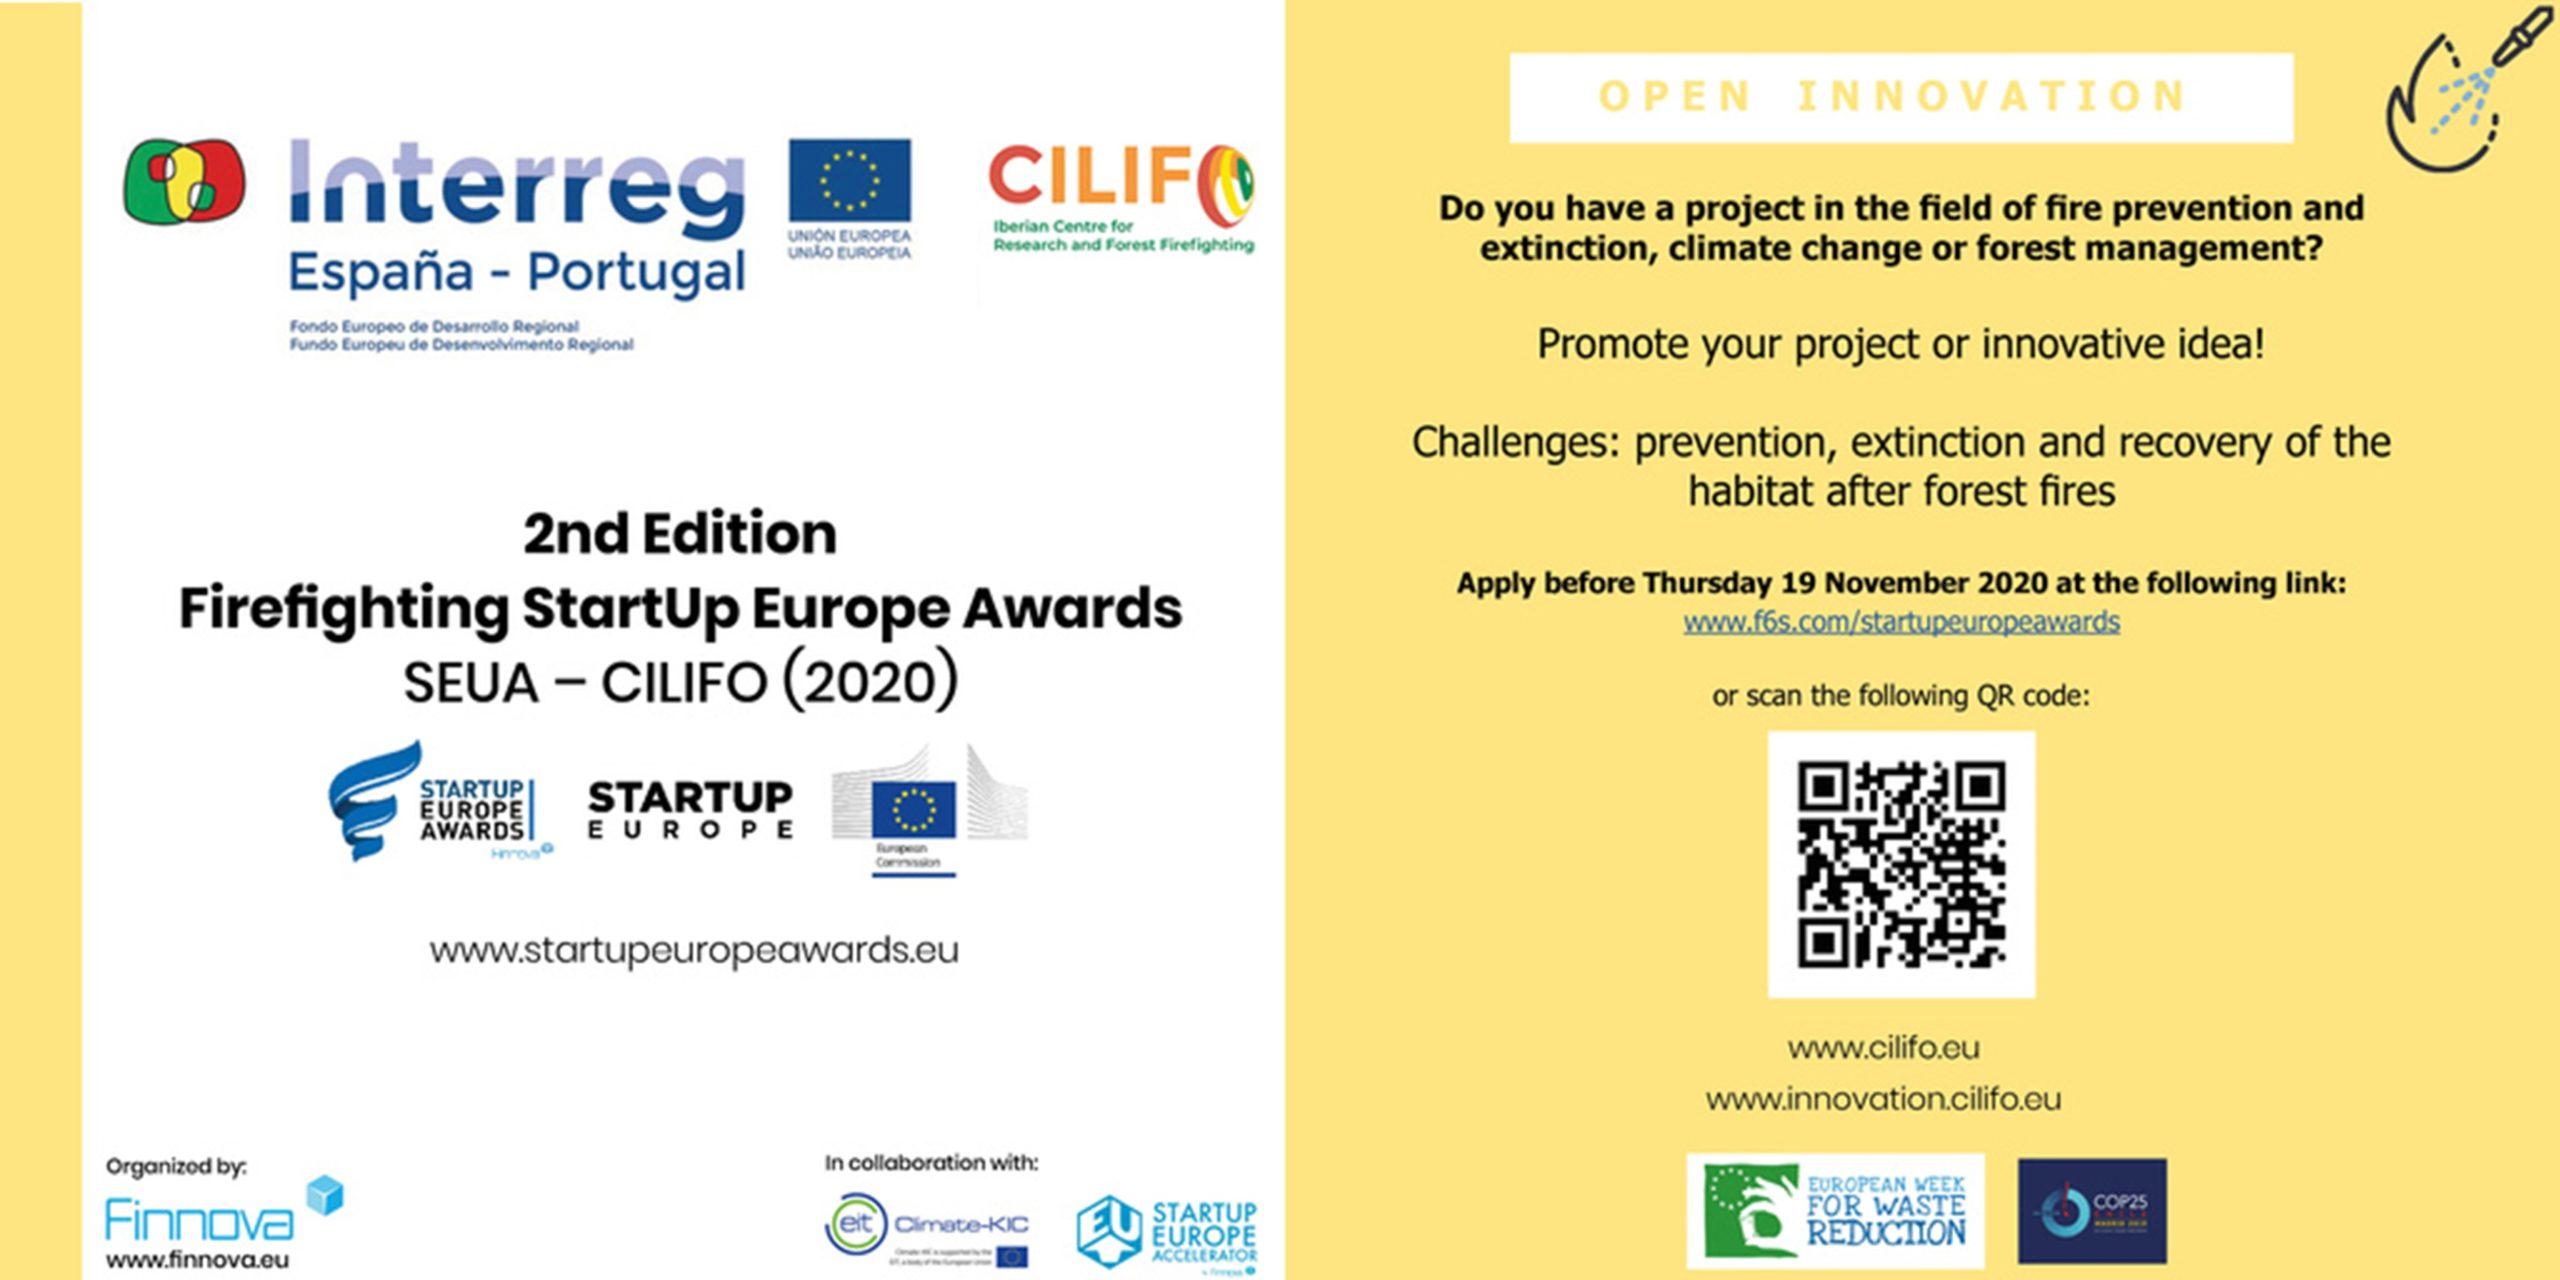 CILIFO Startup Europe Awards